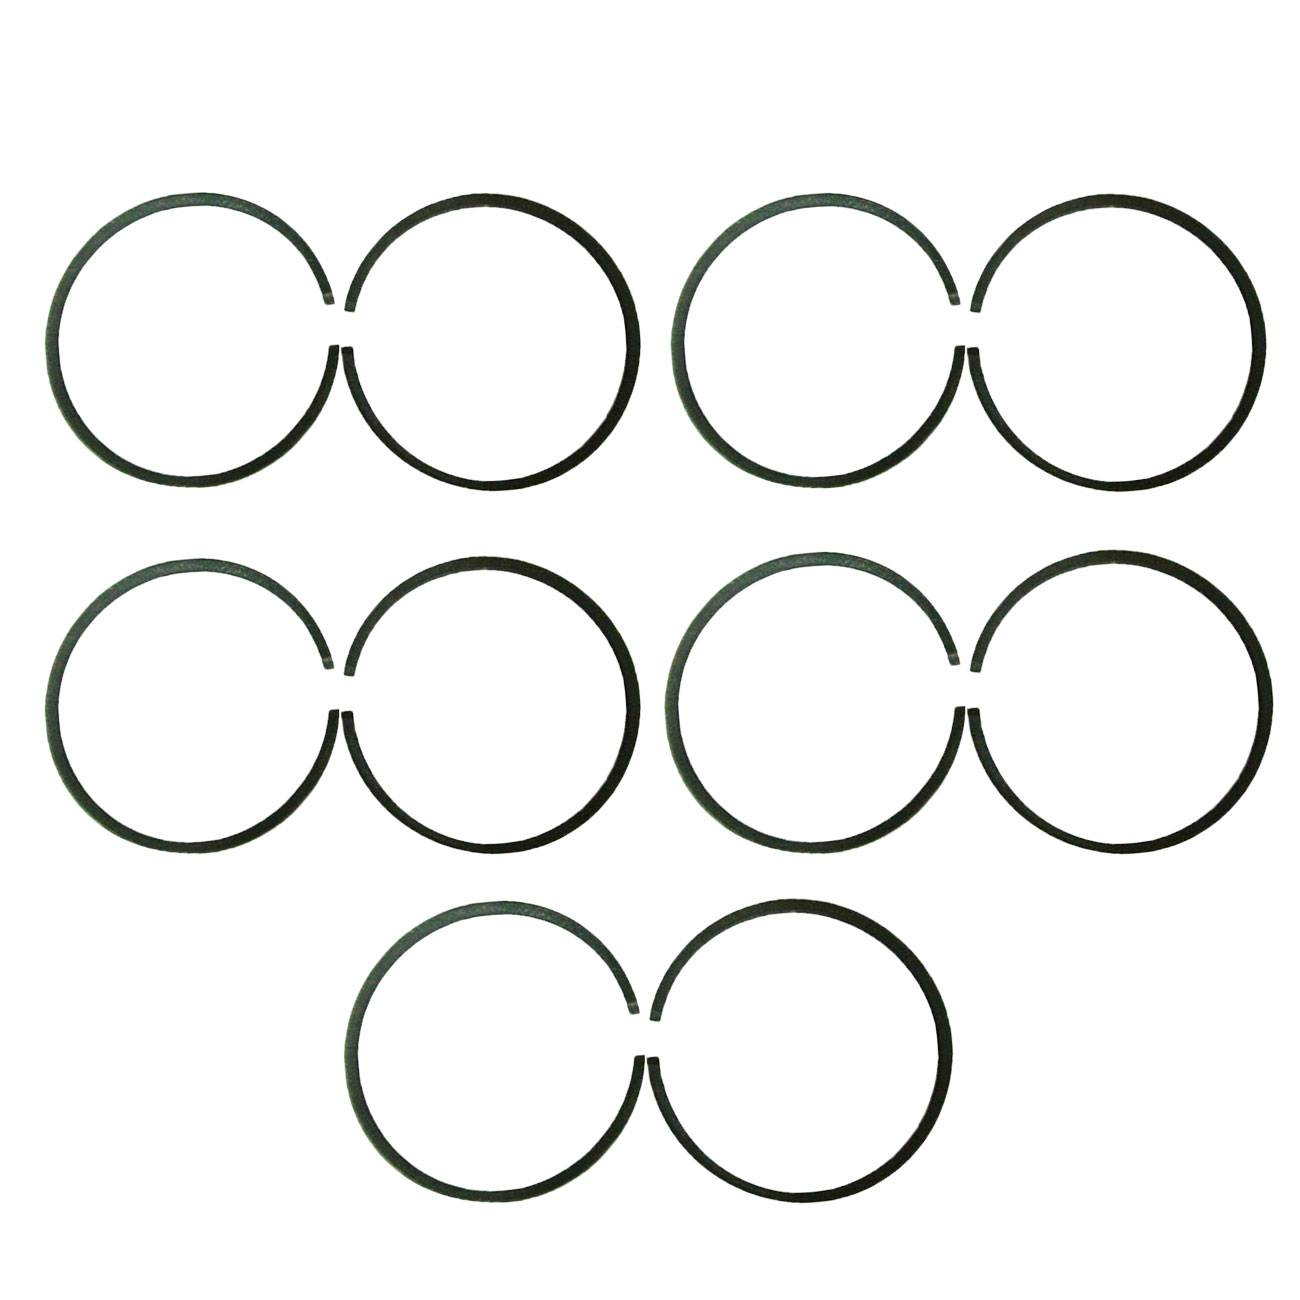 10x 47mm Piston Rings For 66cc 80cc Engine Motorised